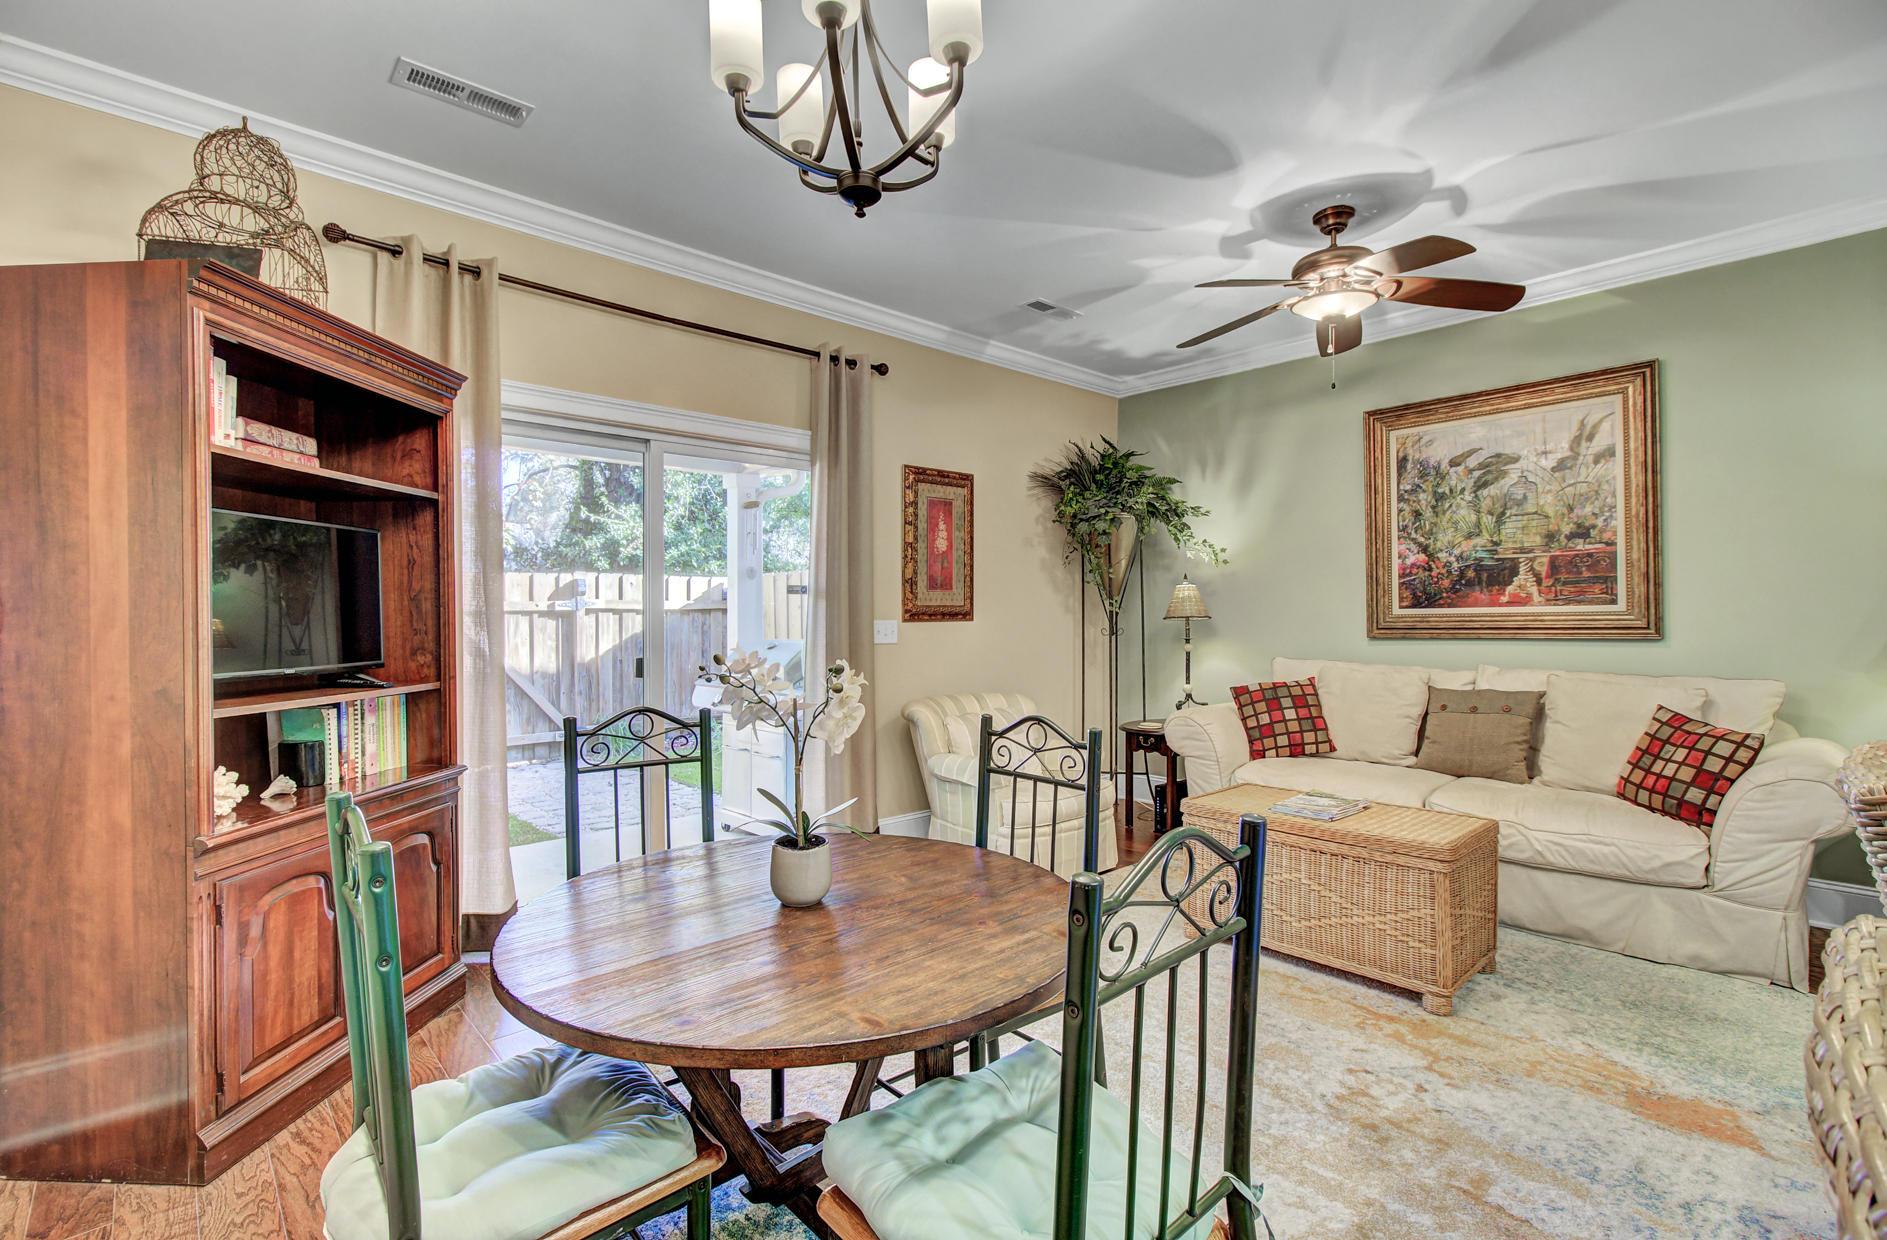 Carol Oaks Town Homes Homes For Sale - 2956 Emma, Mount Pleasant, SC - 20